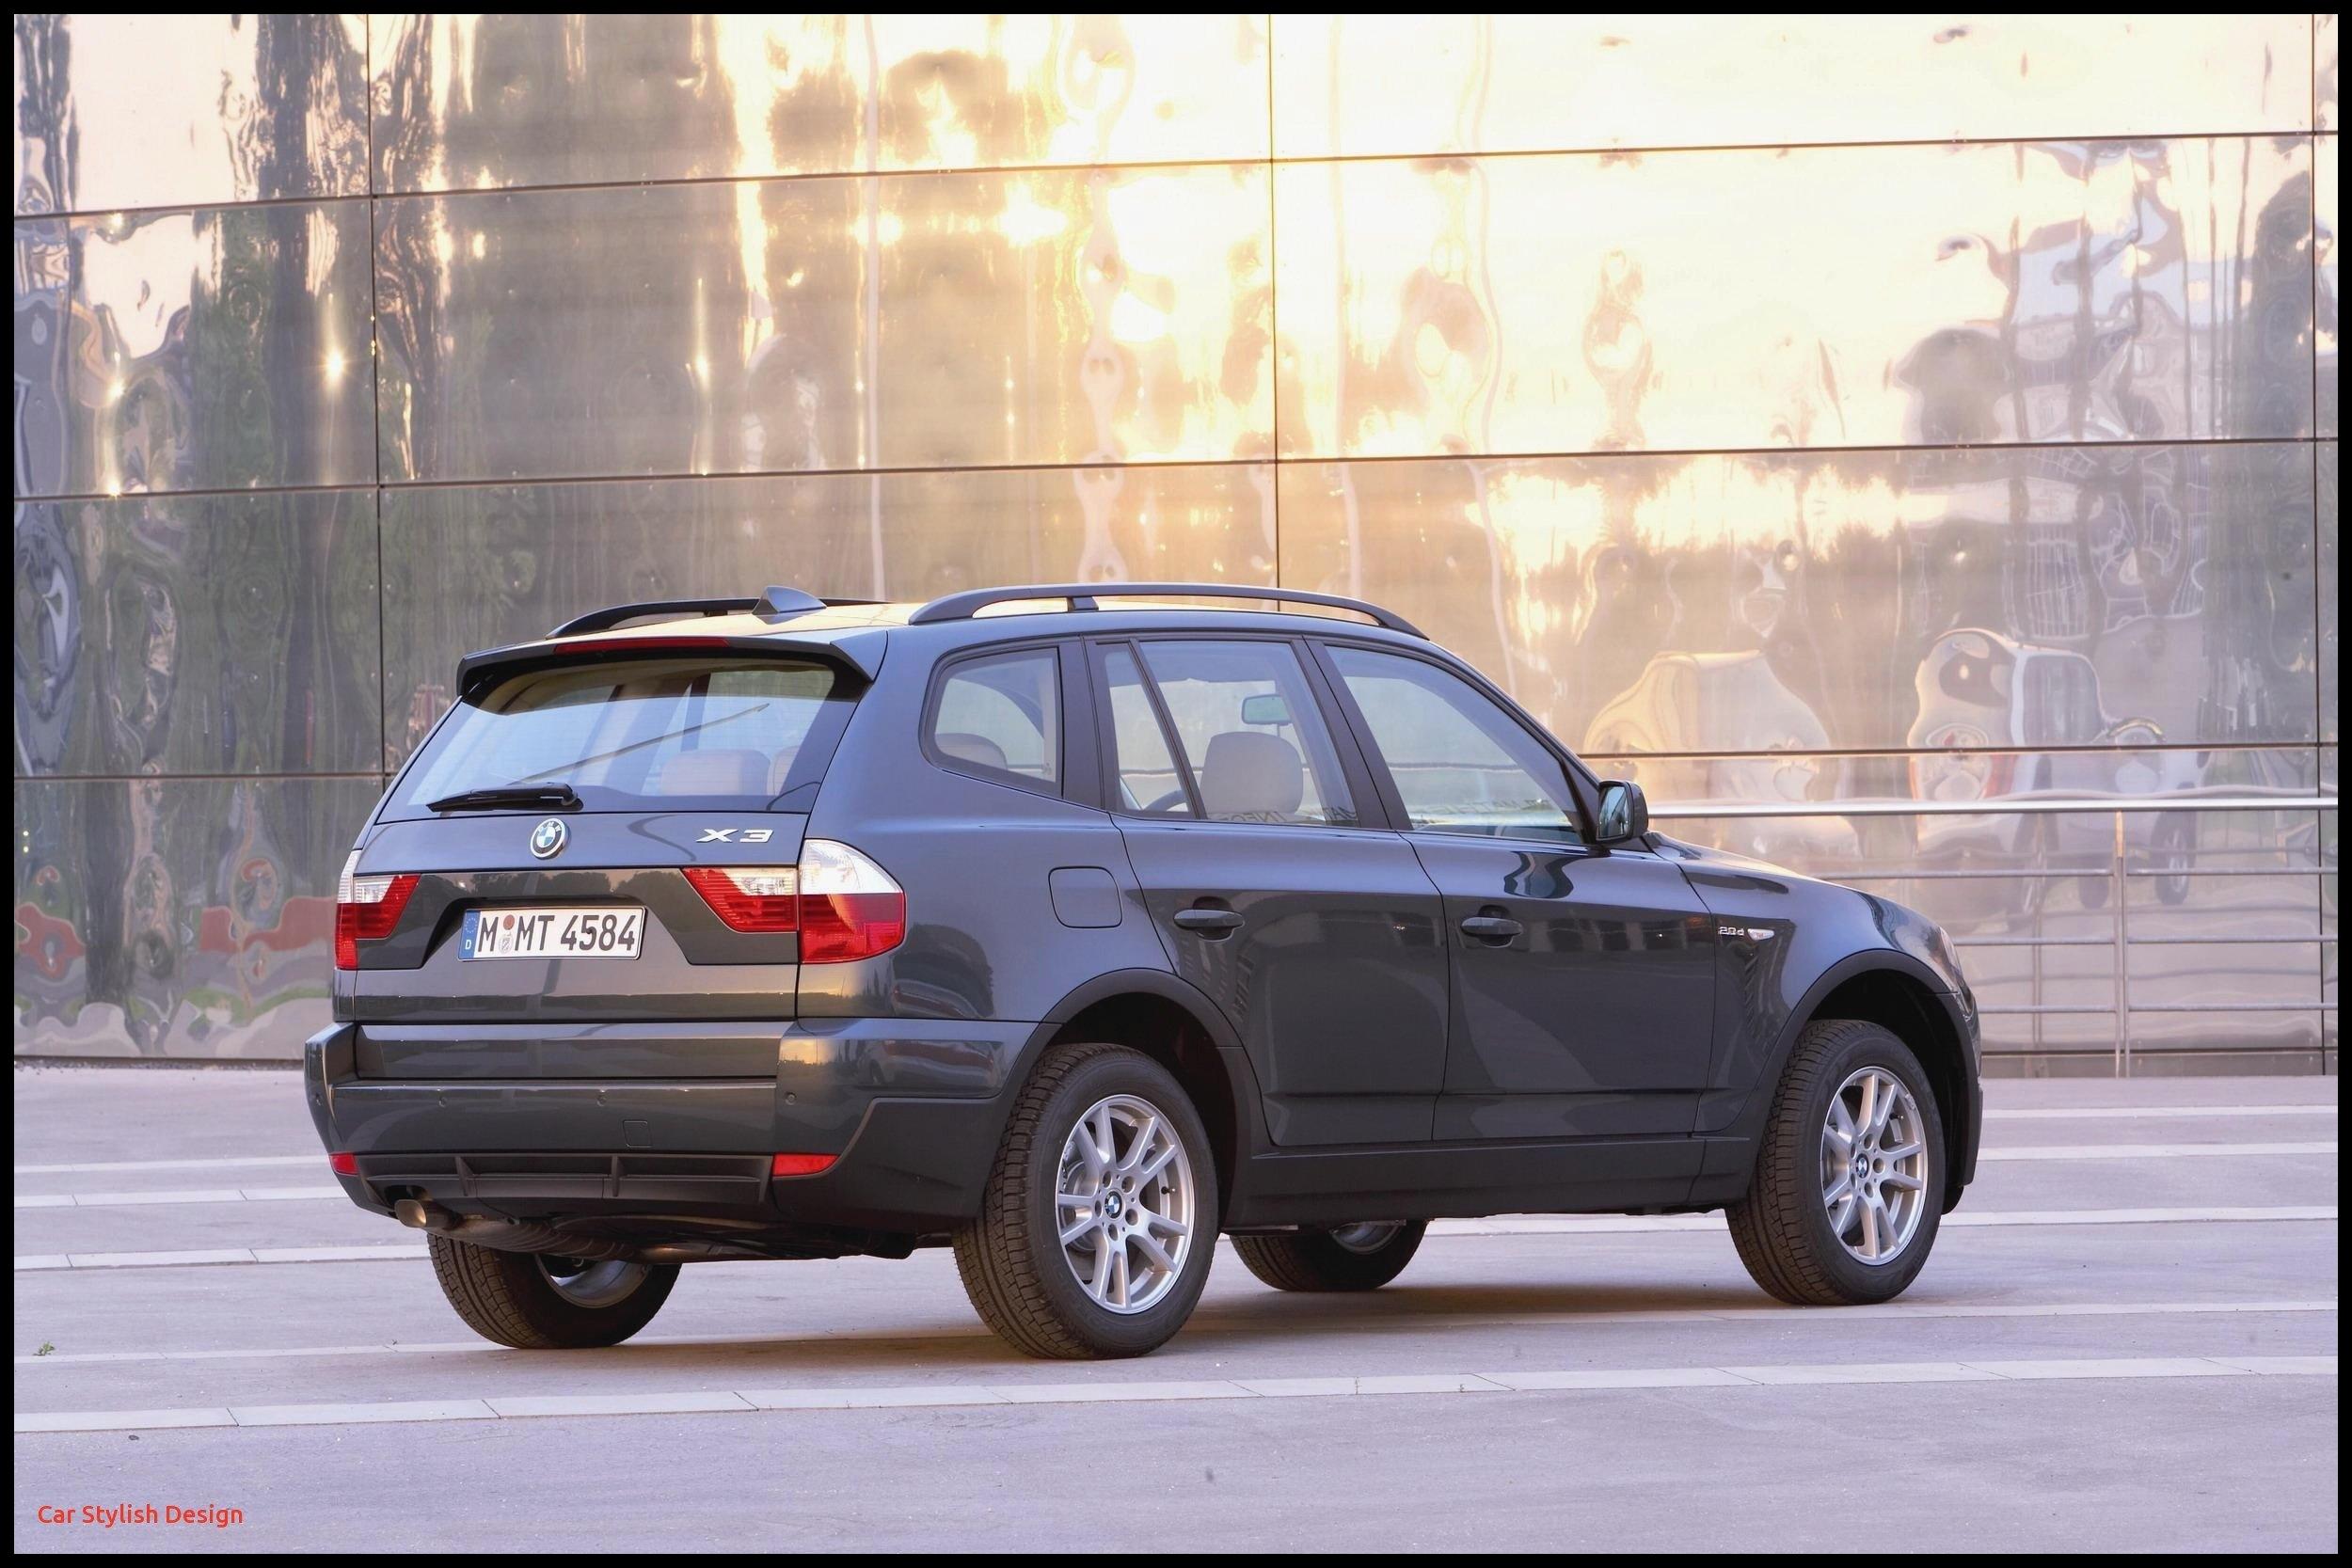 Bmw Roadside New Stylish Bmw X7 S Car Wallpaper Hd